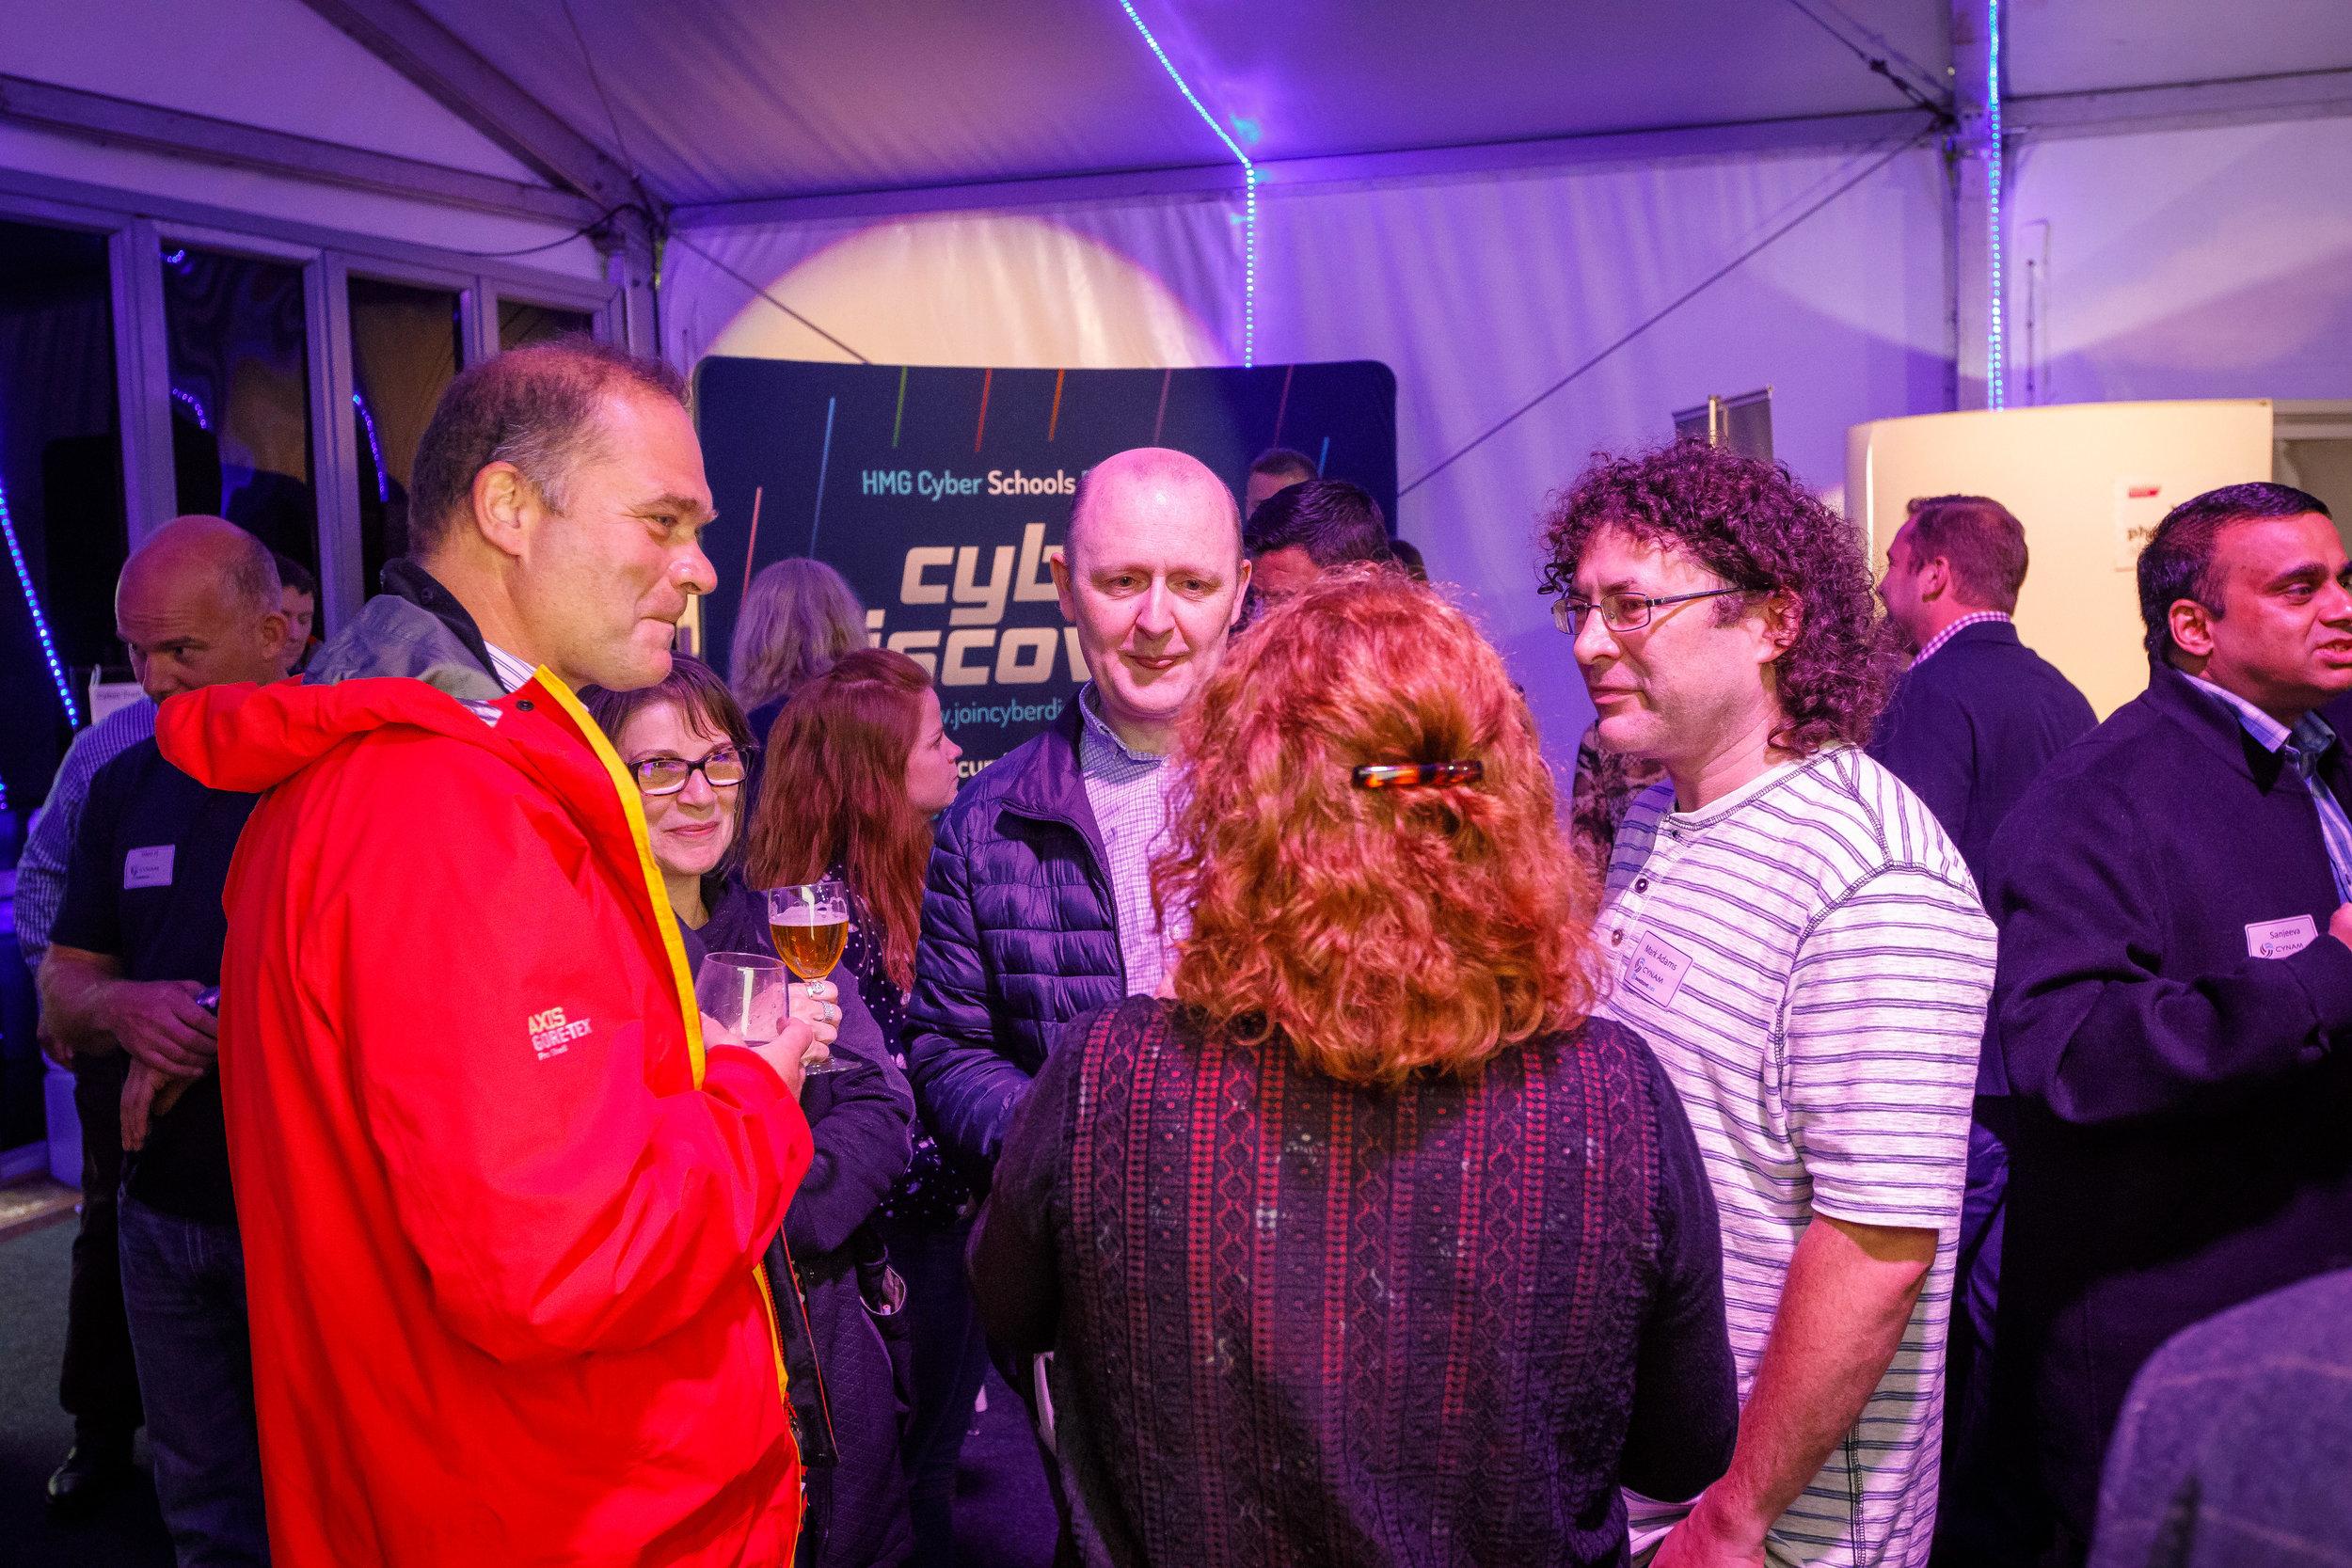 2018.06.08-CyNam-Cheltenham-Science-Festival-iPlus-0015.jpg